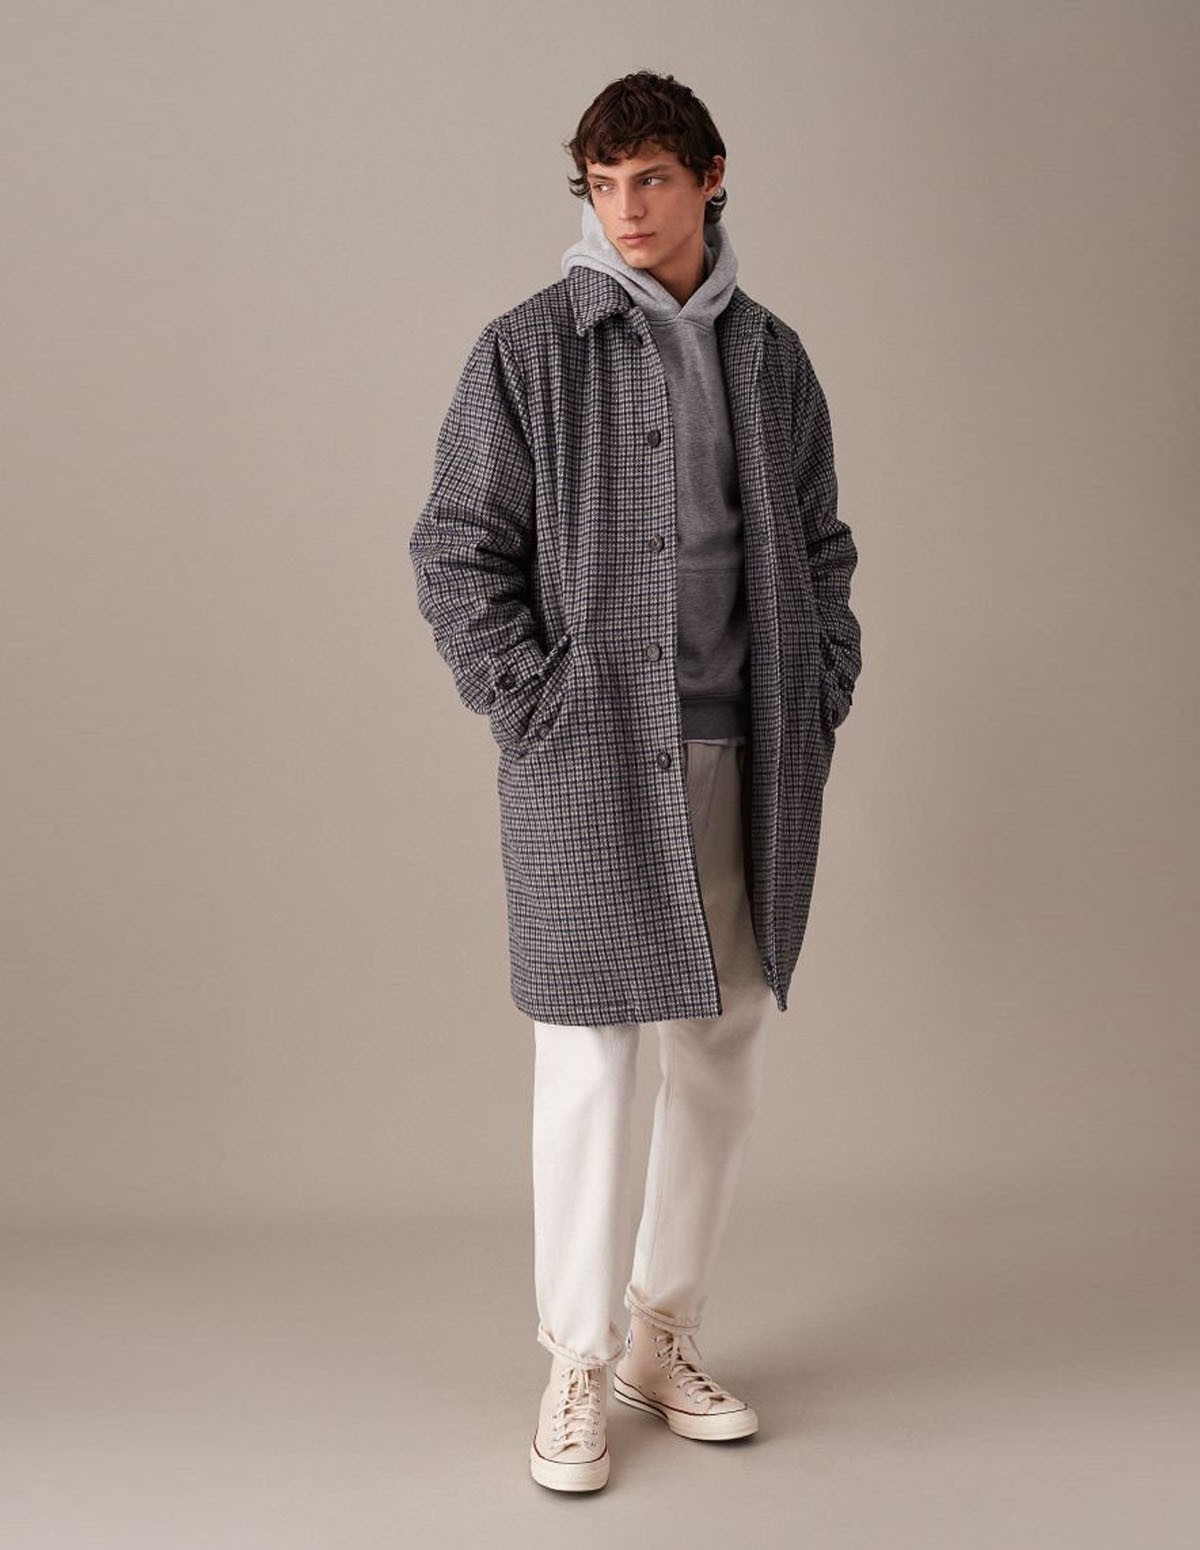 Valstar Wool Padded Overcoat - GREY HOUNDSTOOTH